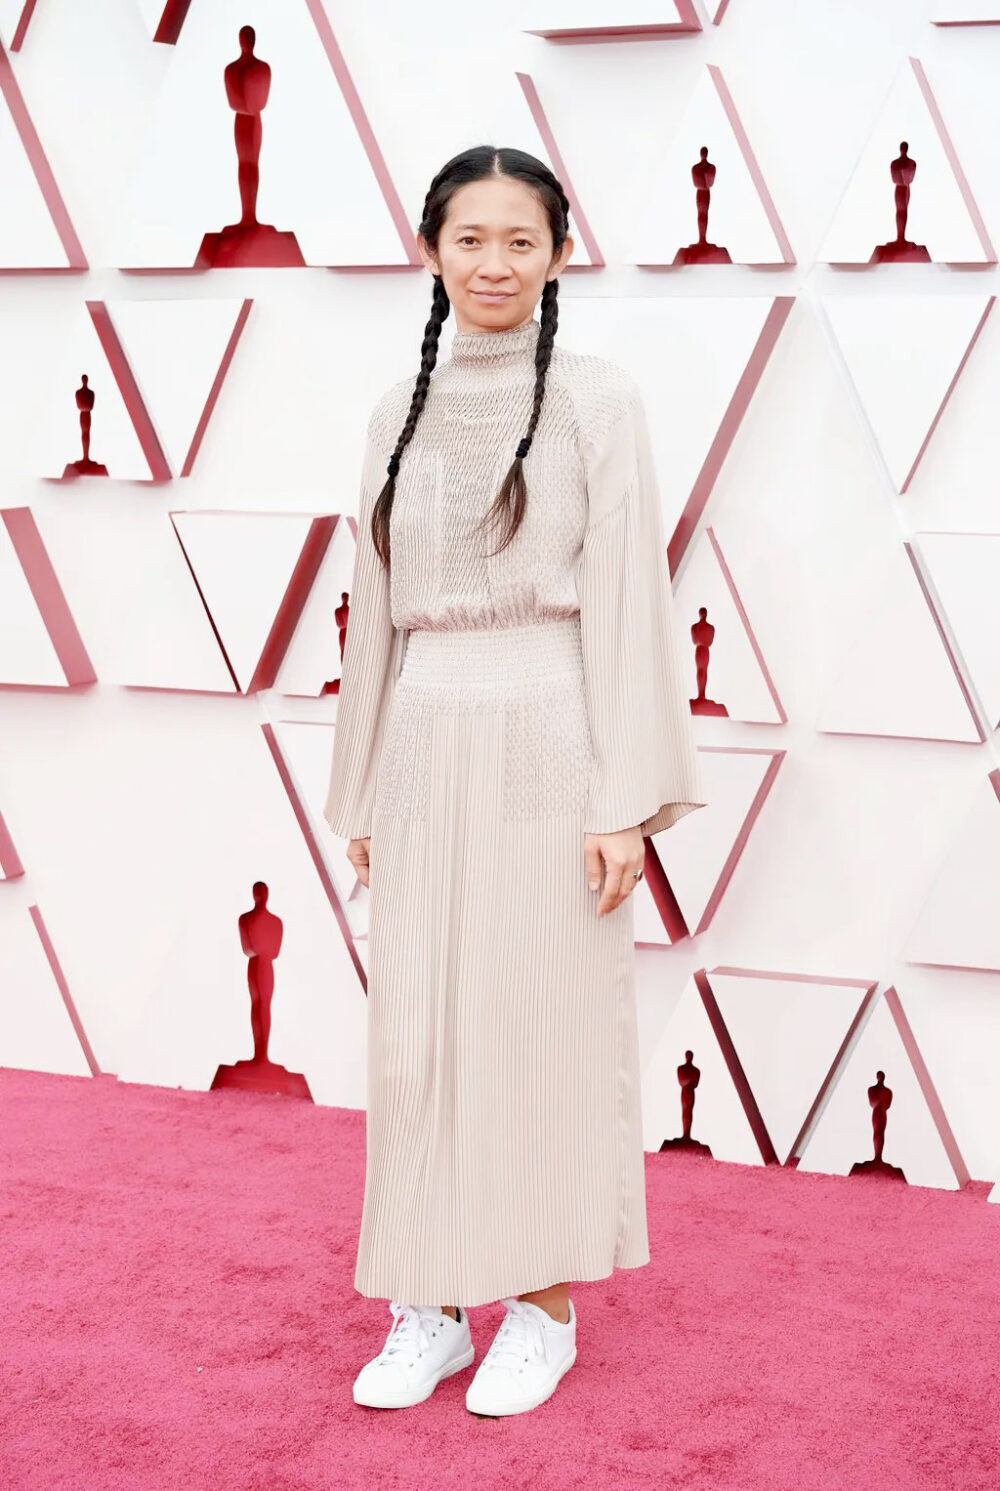 2021 Oscars Fashion I Best Director Chloe Zhao in Hermes FW21 #fashionstyle #stylish